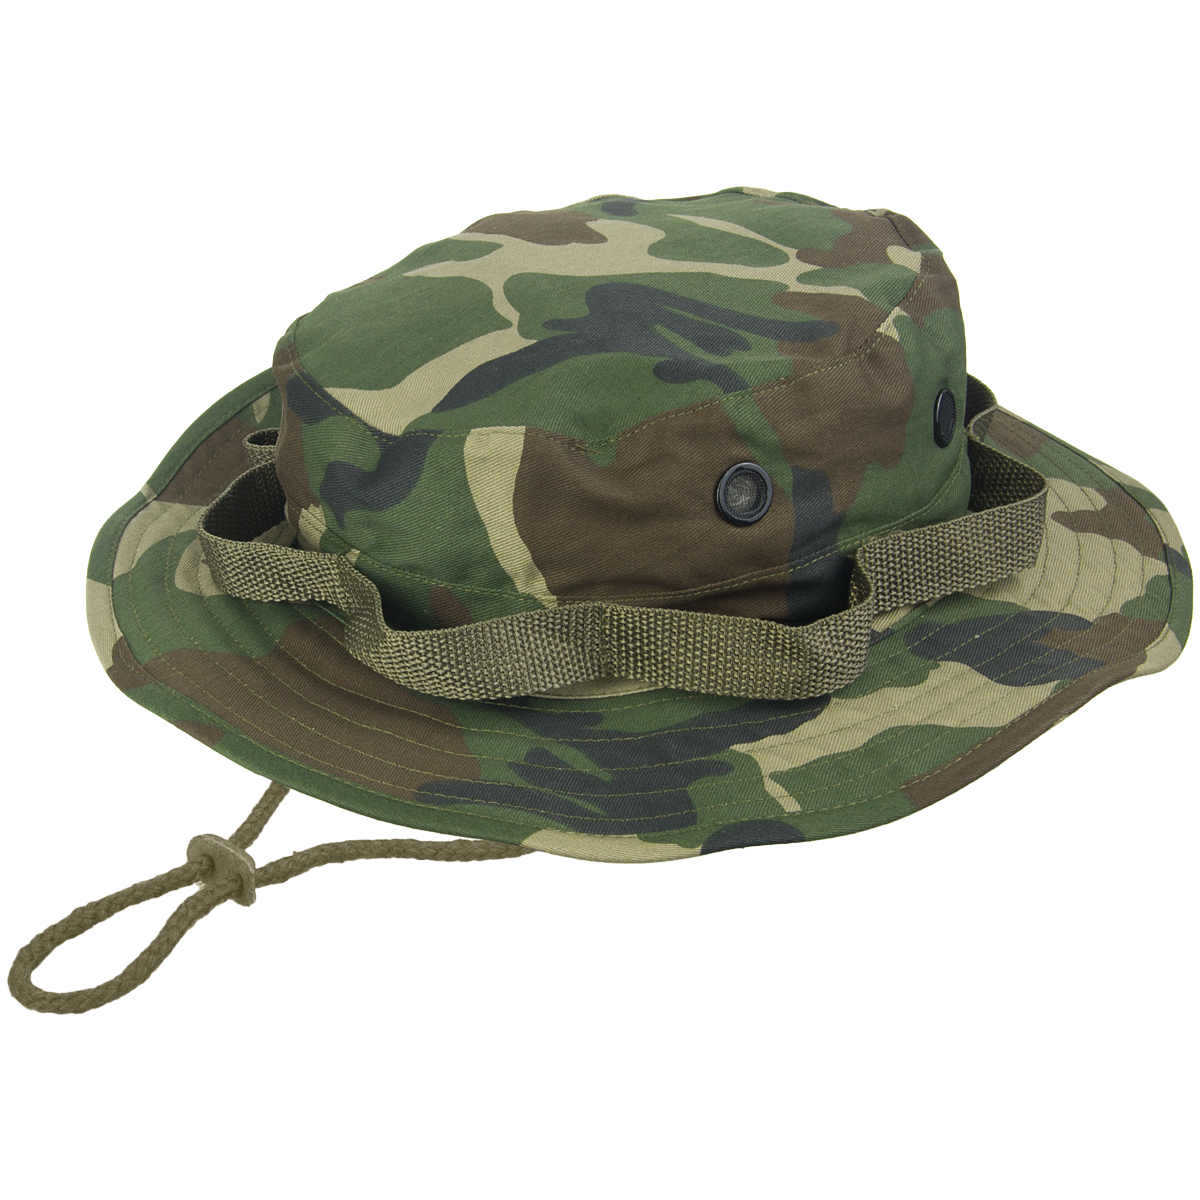 Sentinel Army Tactical Jungle Boonie Bush Hat Bushcraft Hiking Travel  Woodland Camo S-XXL 84bf5b57282